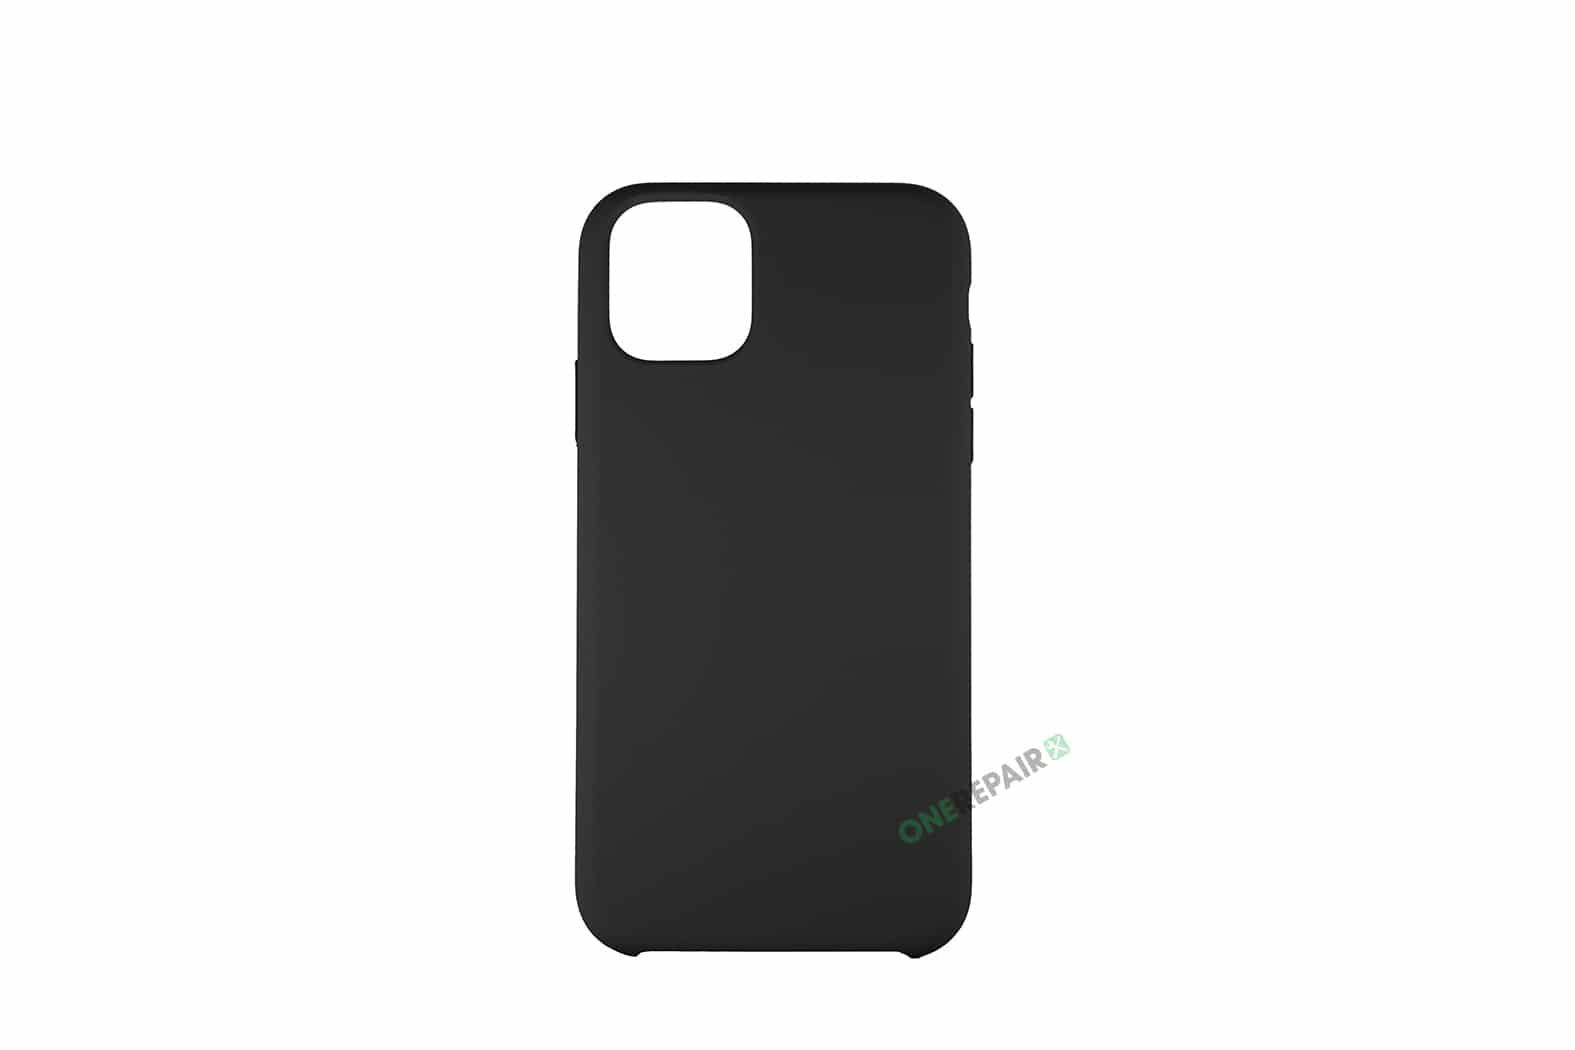 353778-001_iPhone_11_pro_silikone_cover_sort_OneRepair_00001